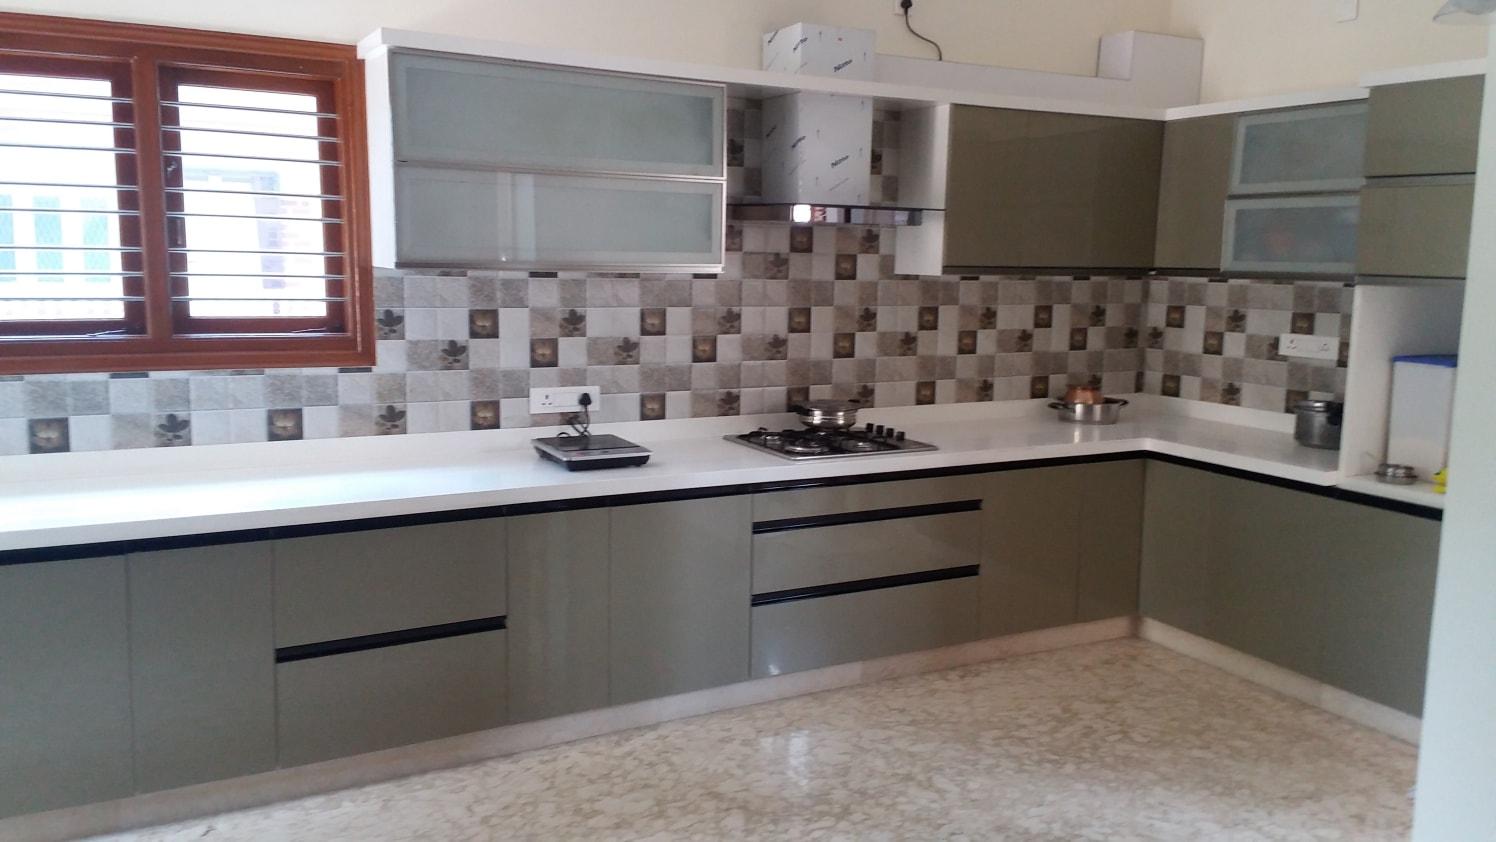 Modular Kitchen by Padmaja S.